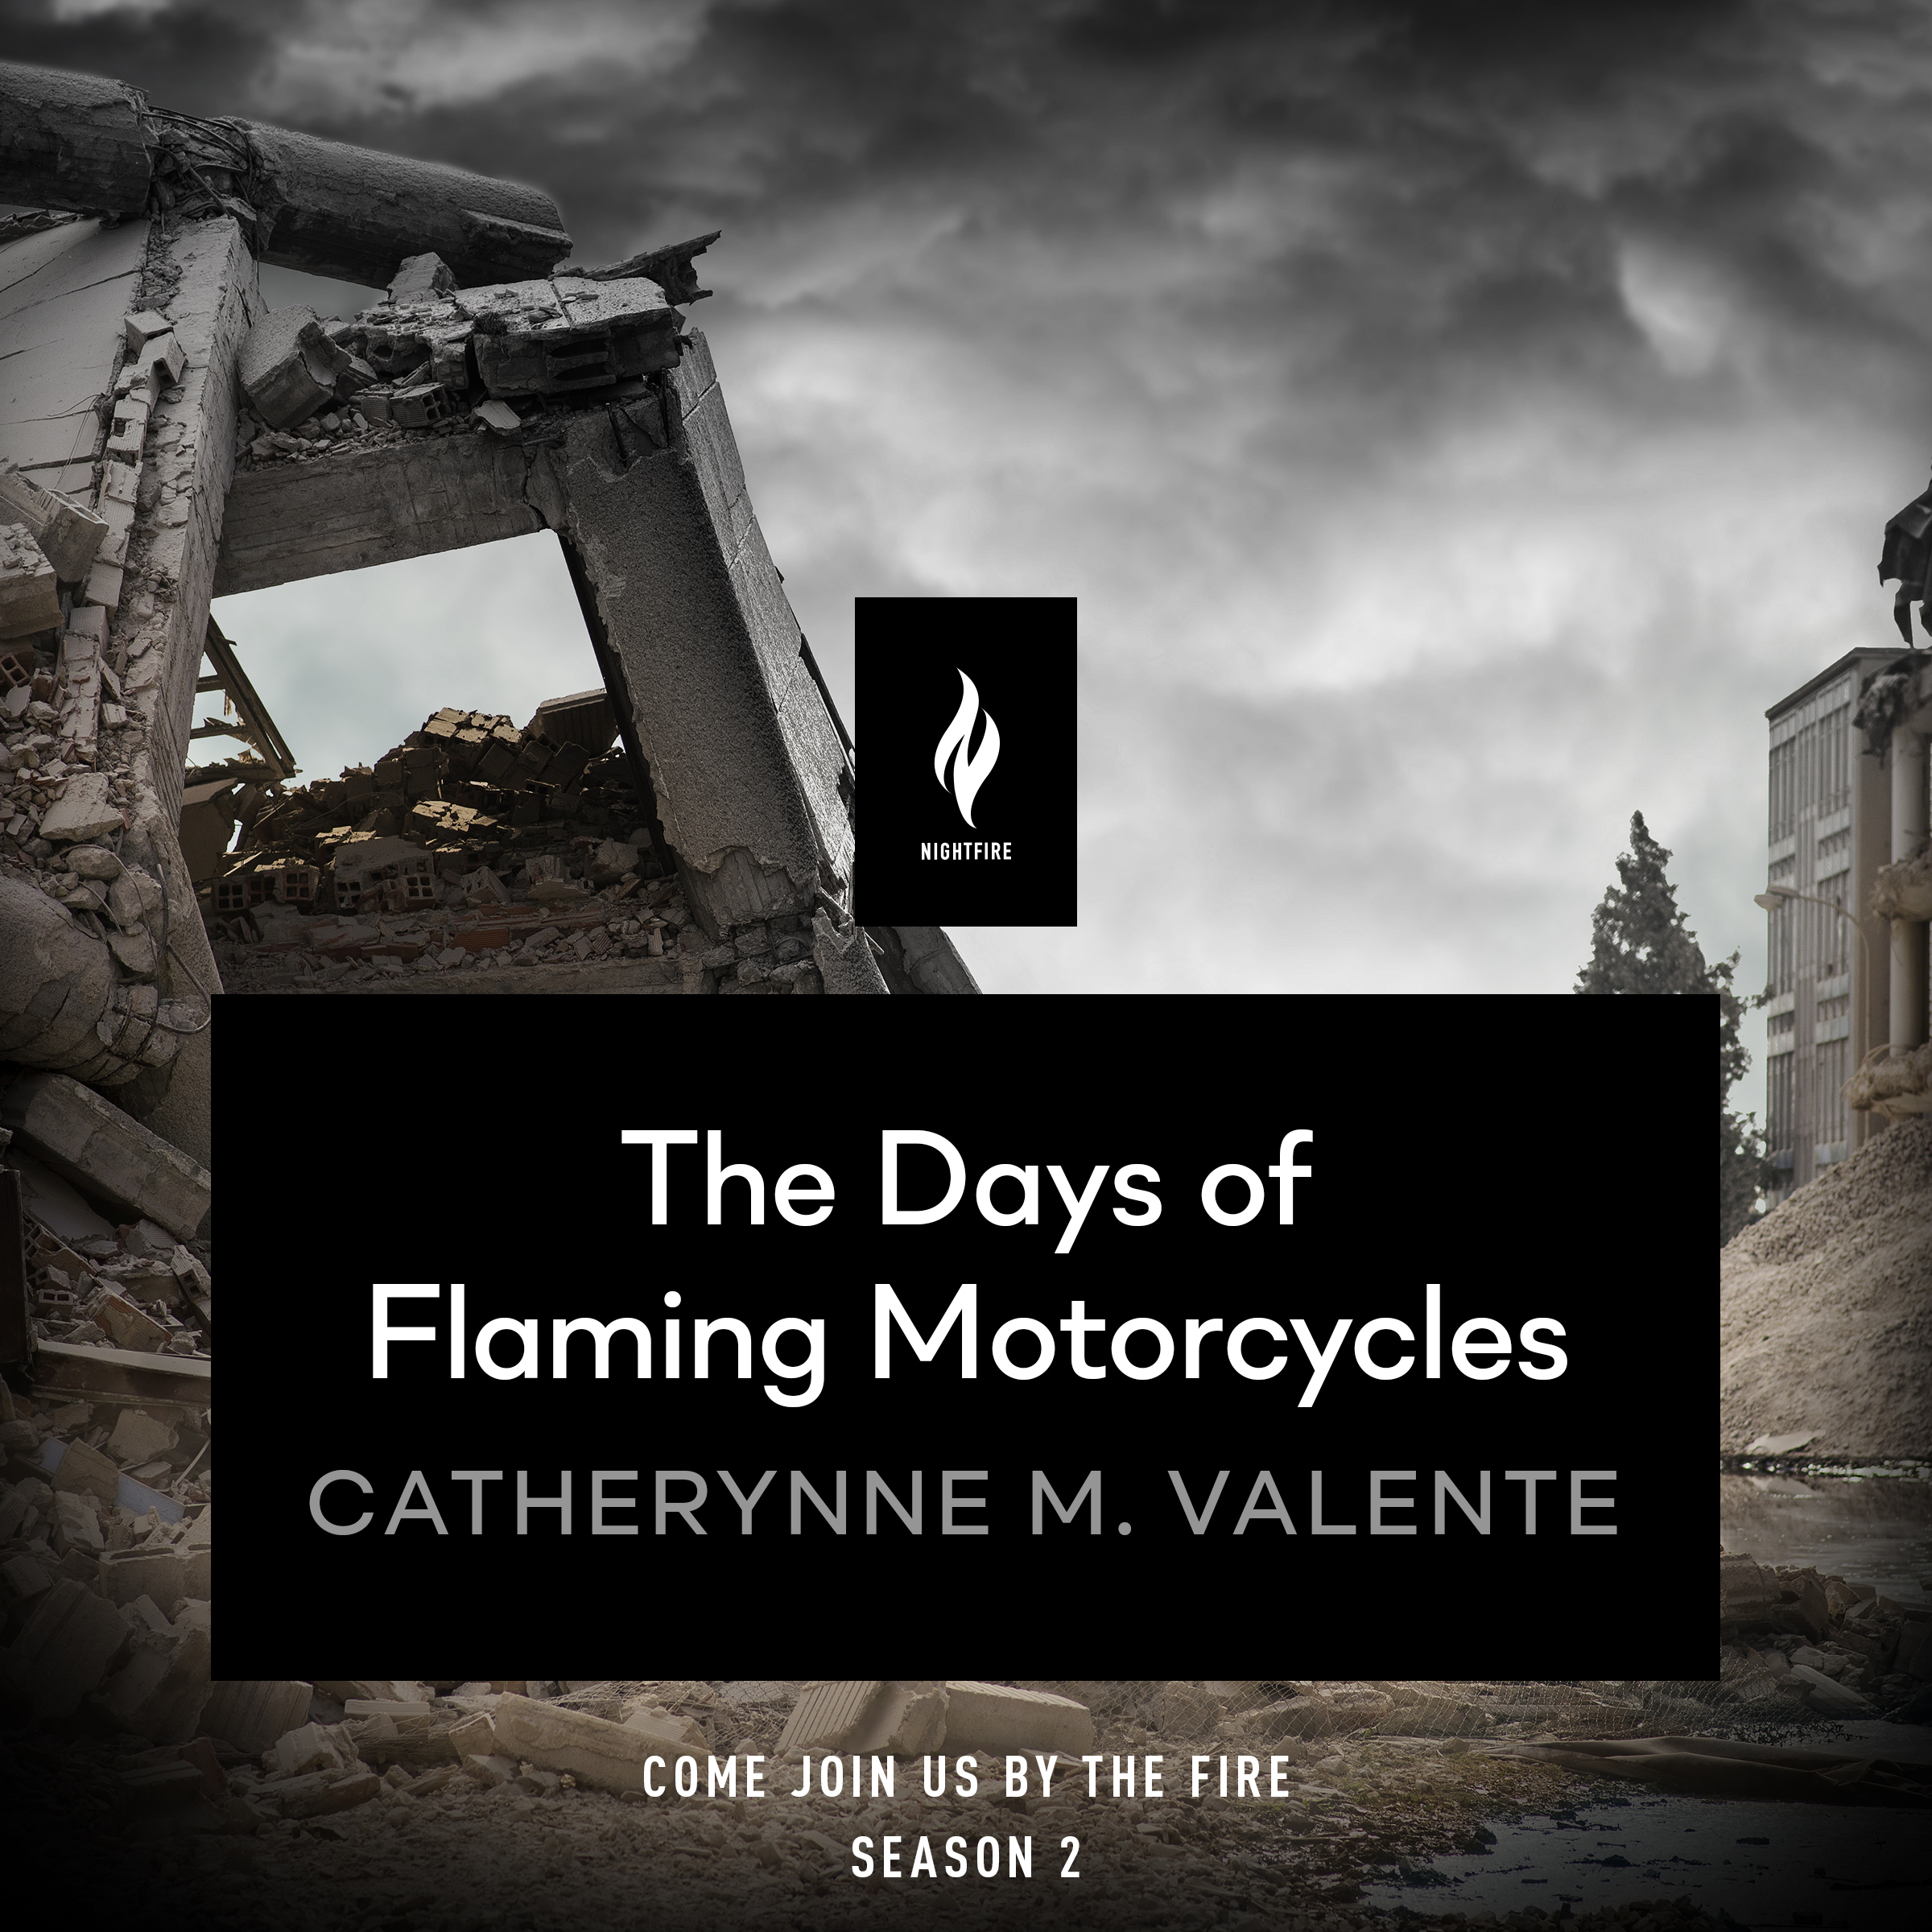 DaysofFlamingMotorcycles_Valente